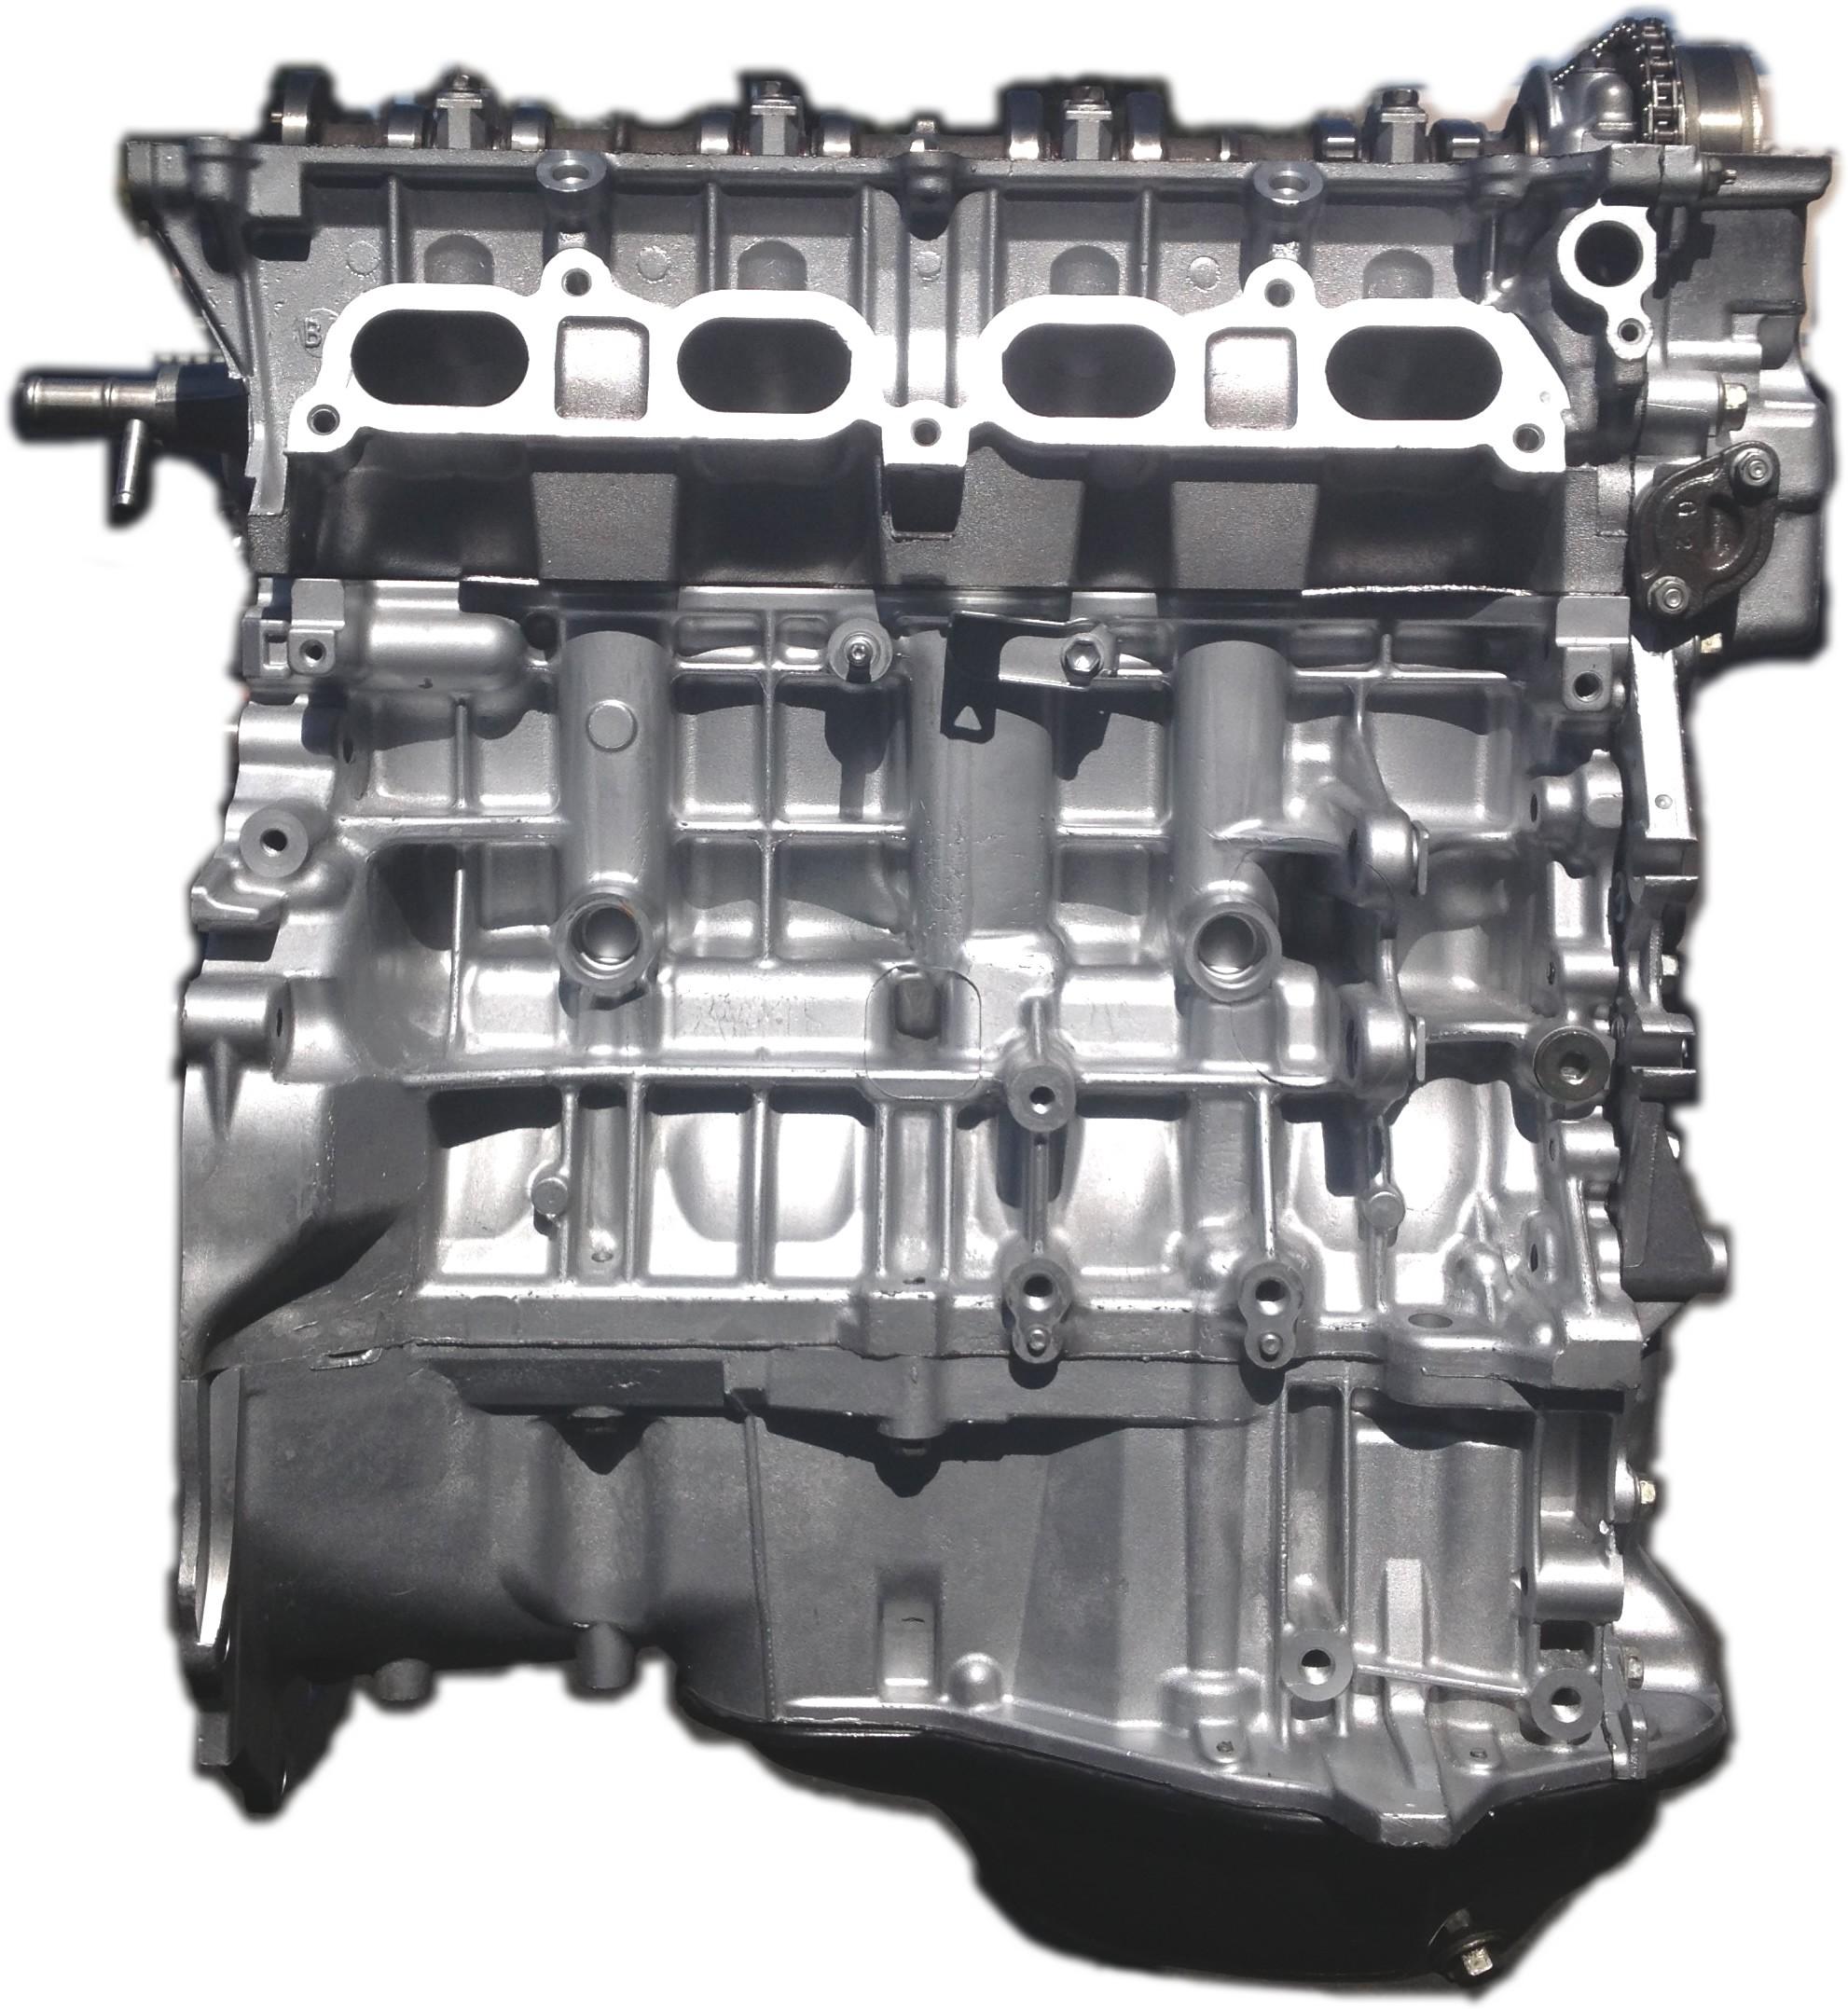 03 Toyota Corolla Engine: Rebuilt 03-07 Toyota Matrix 1.8L 1ZZFE VVTi Engine « Kar